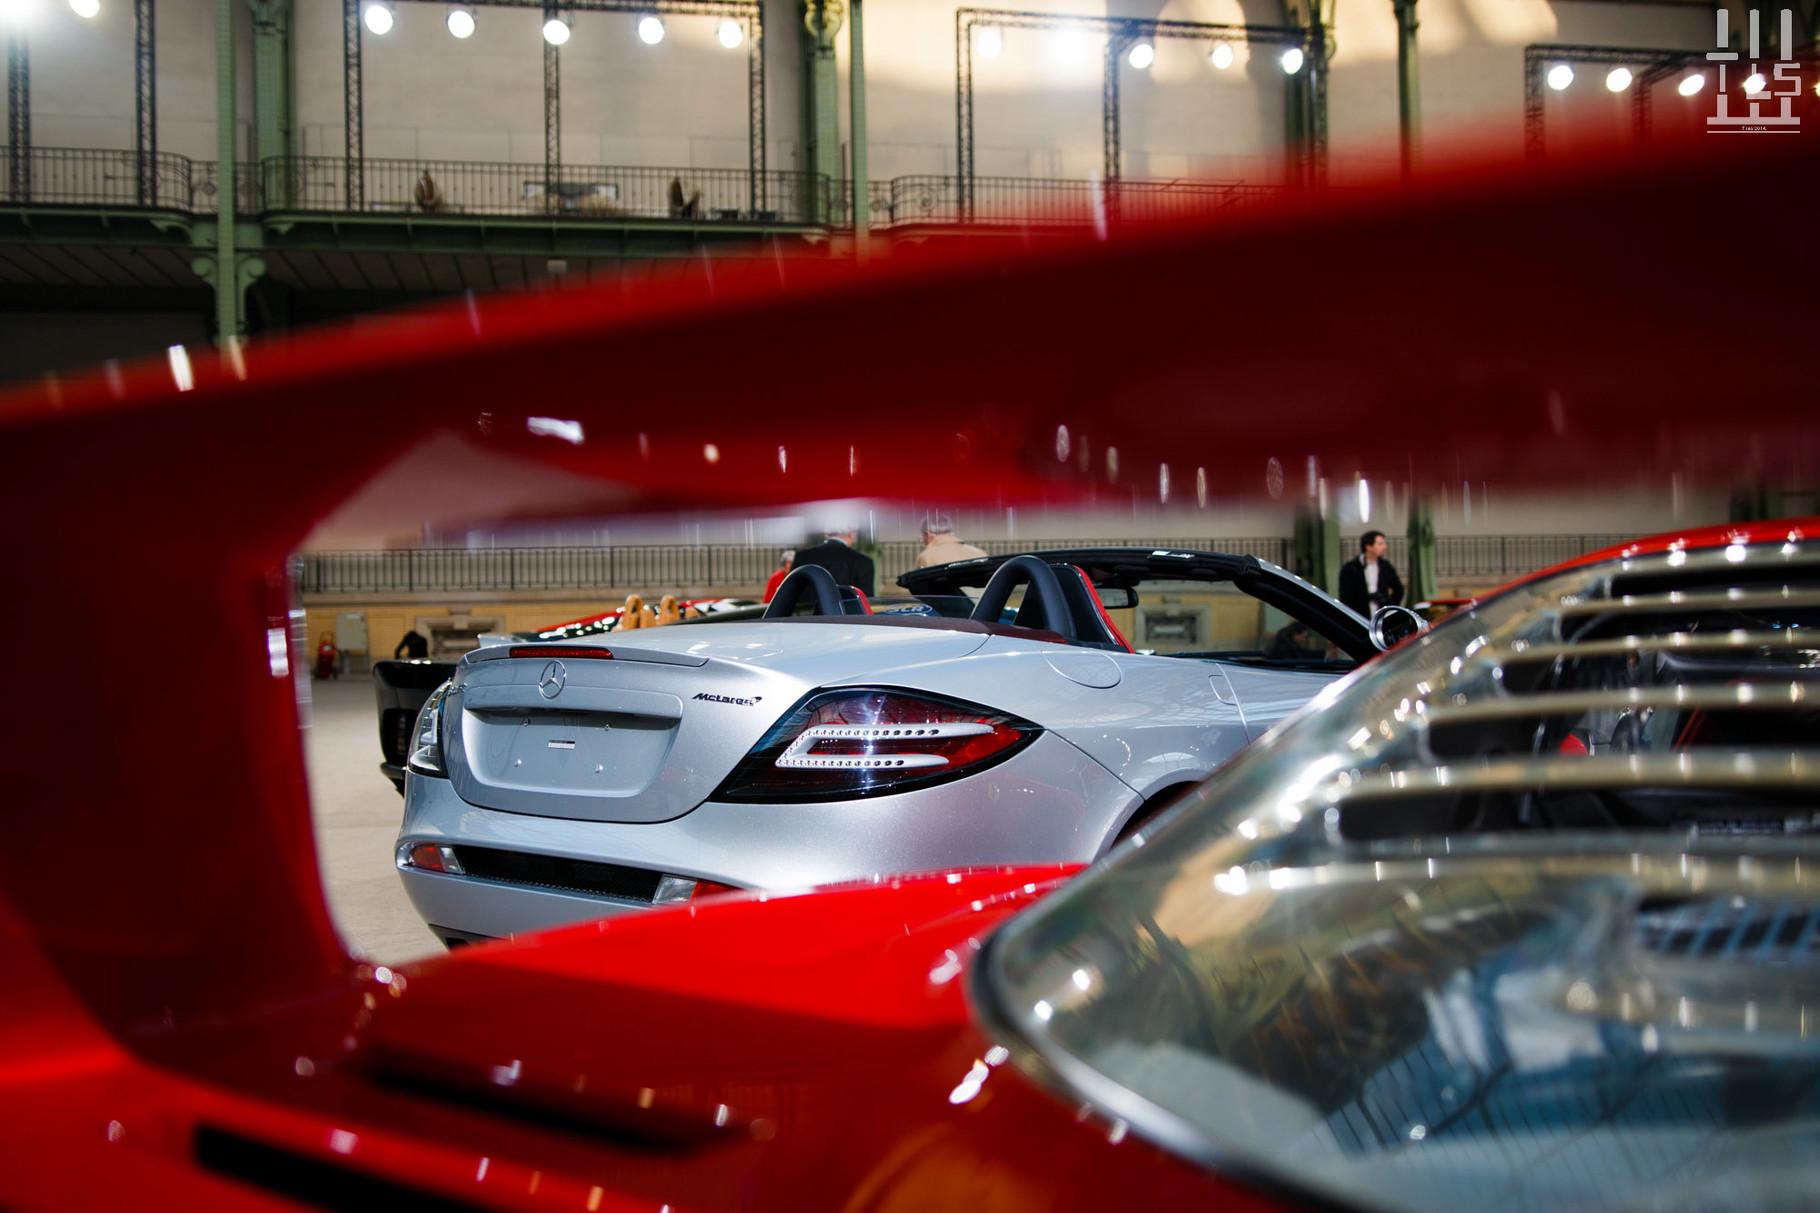 Mercedes-Benz SLR McLaren, vendue à 356 500 euros.